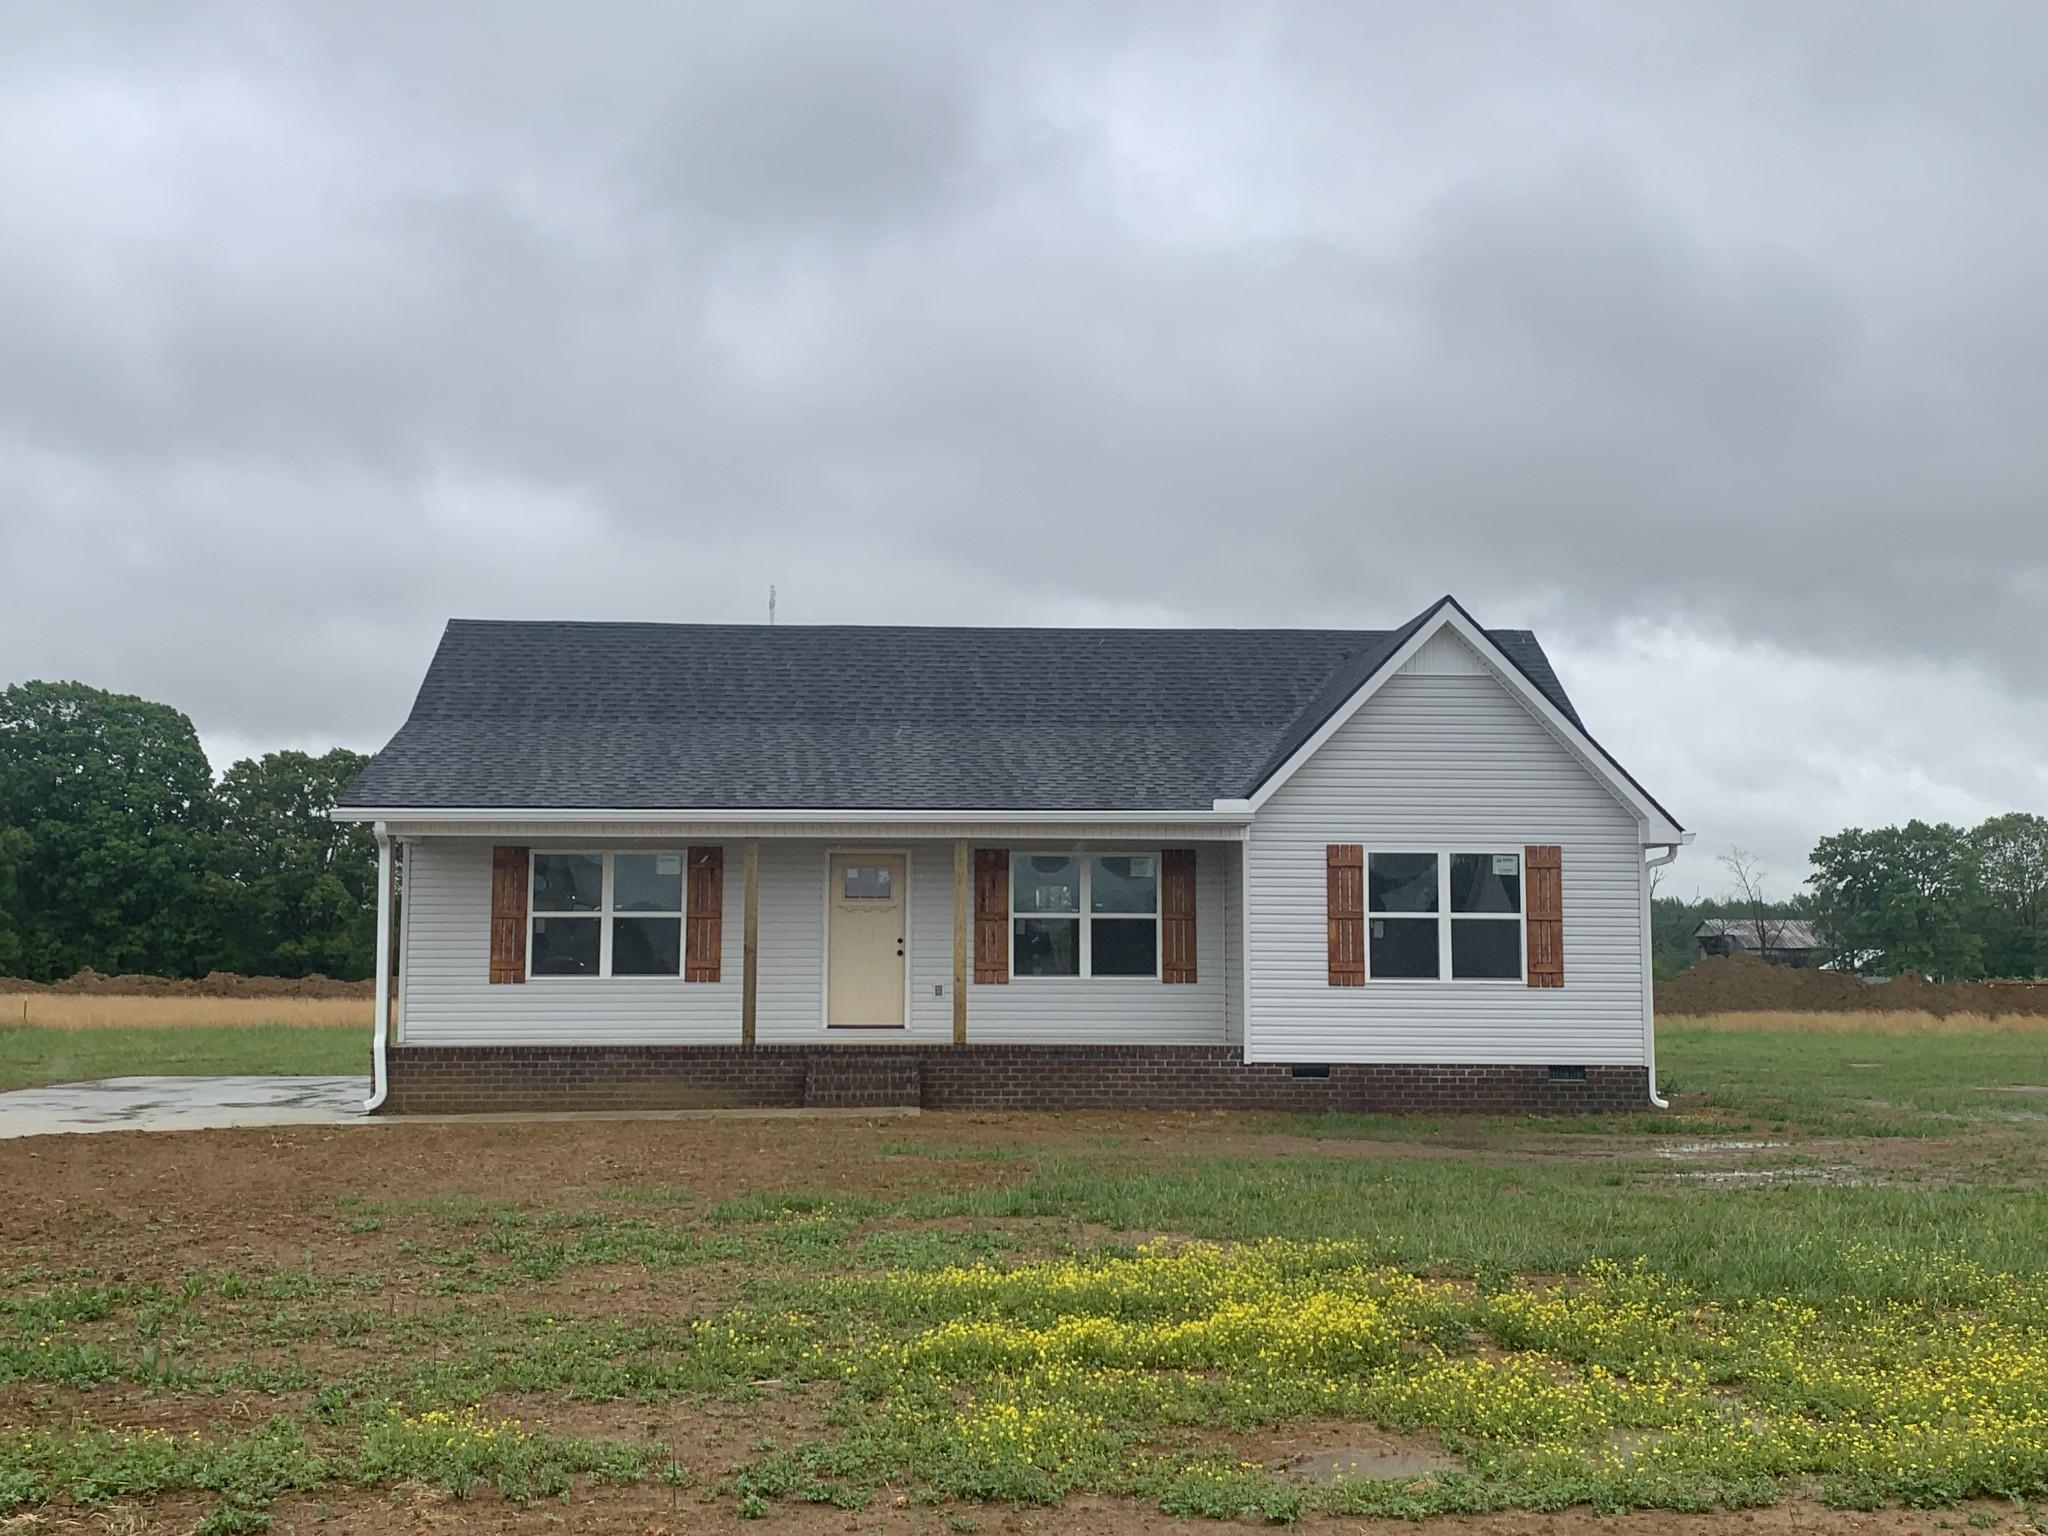 86 Carson Ln Property Photo - Ethridge, TN real estate listing